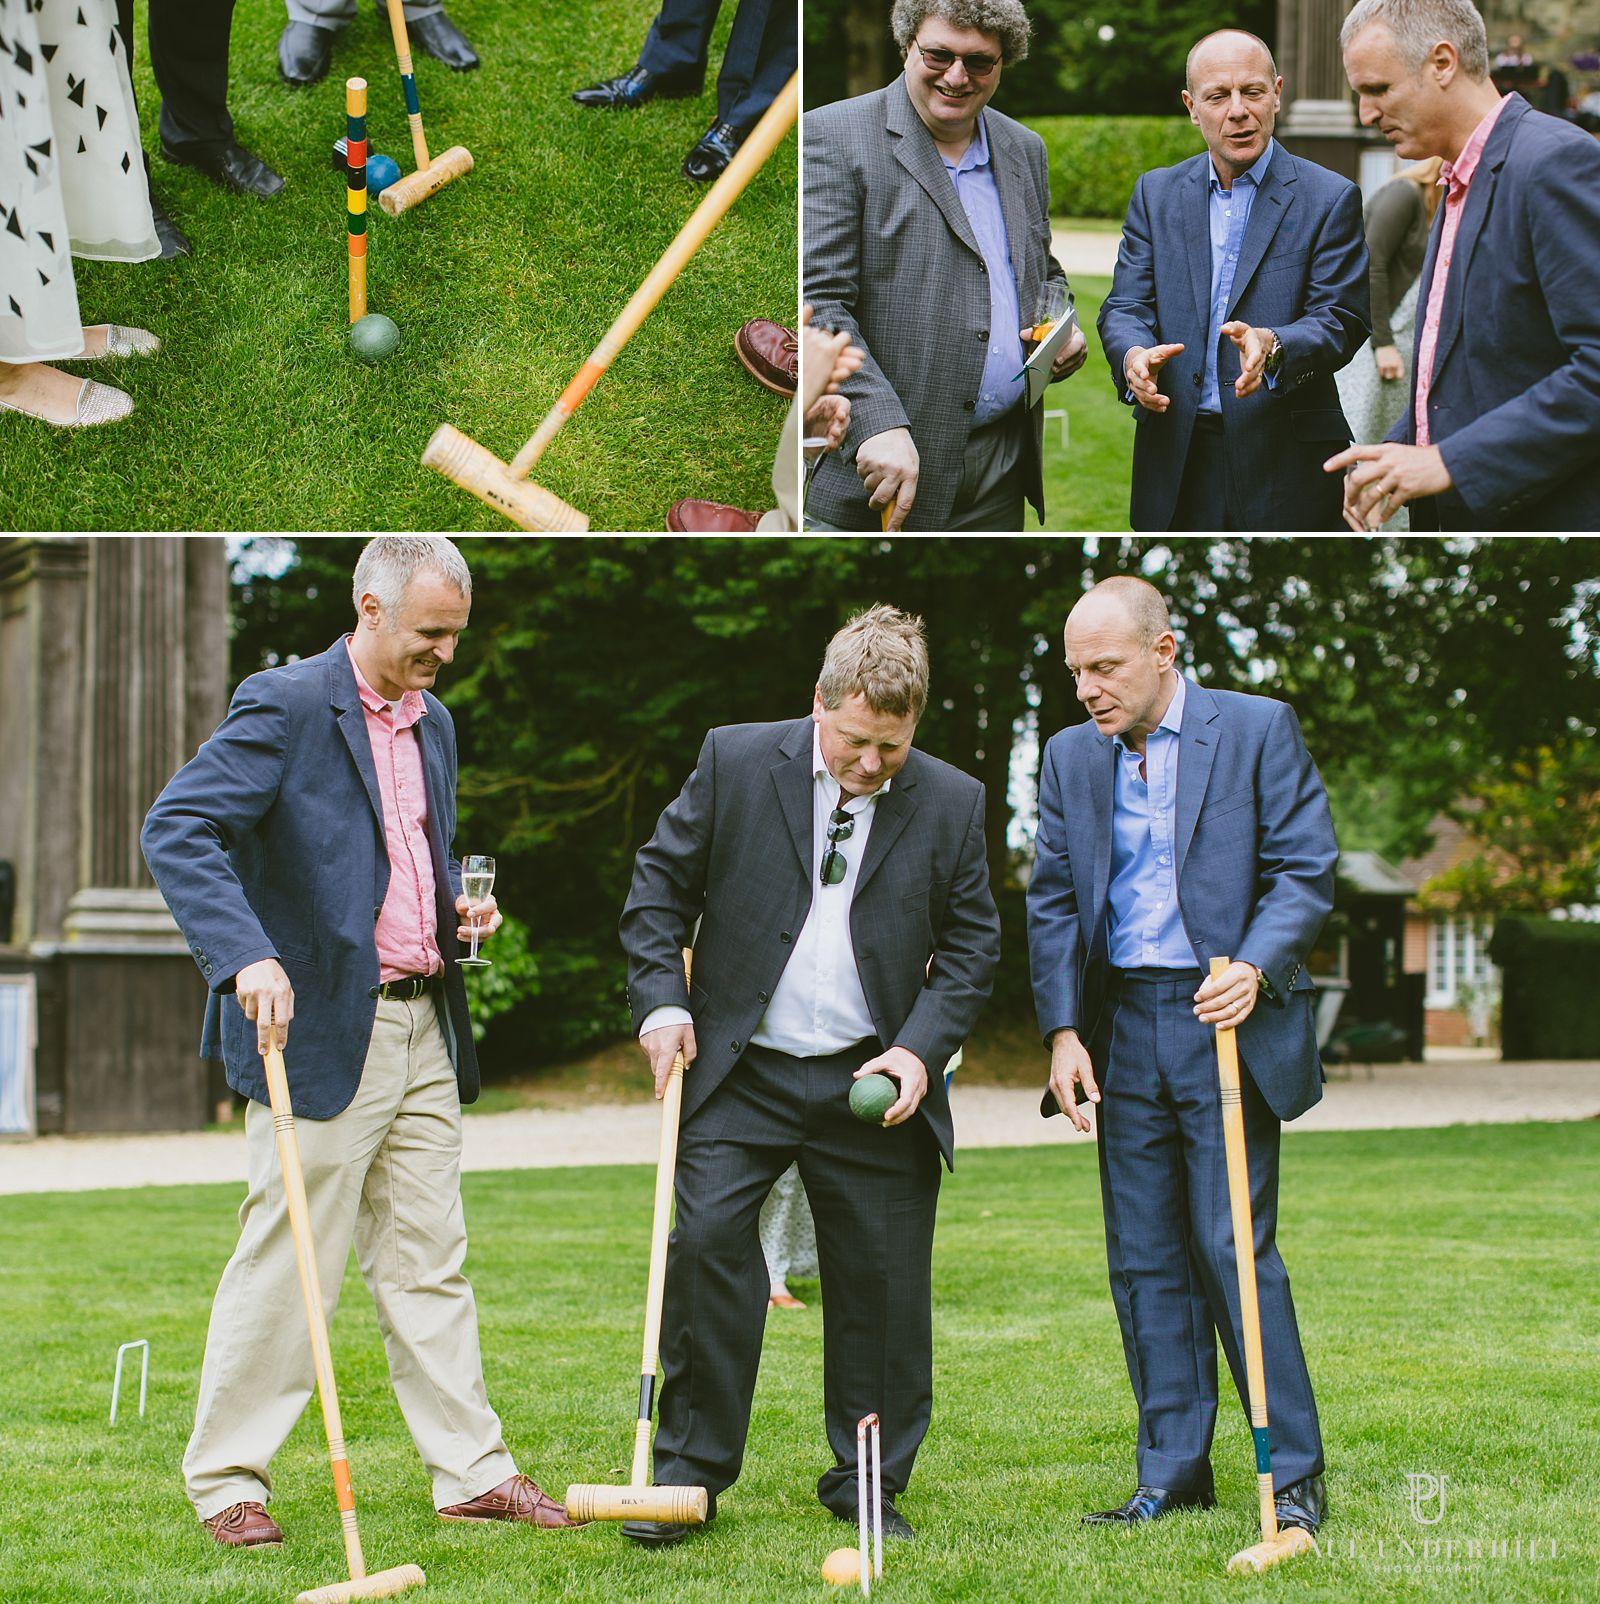 Lawn games at Larmer Tree wedding